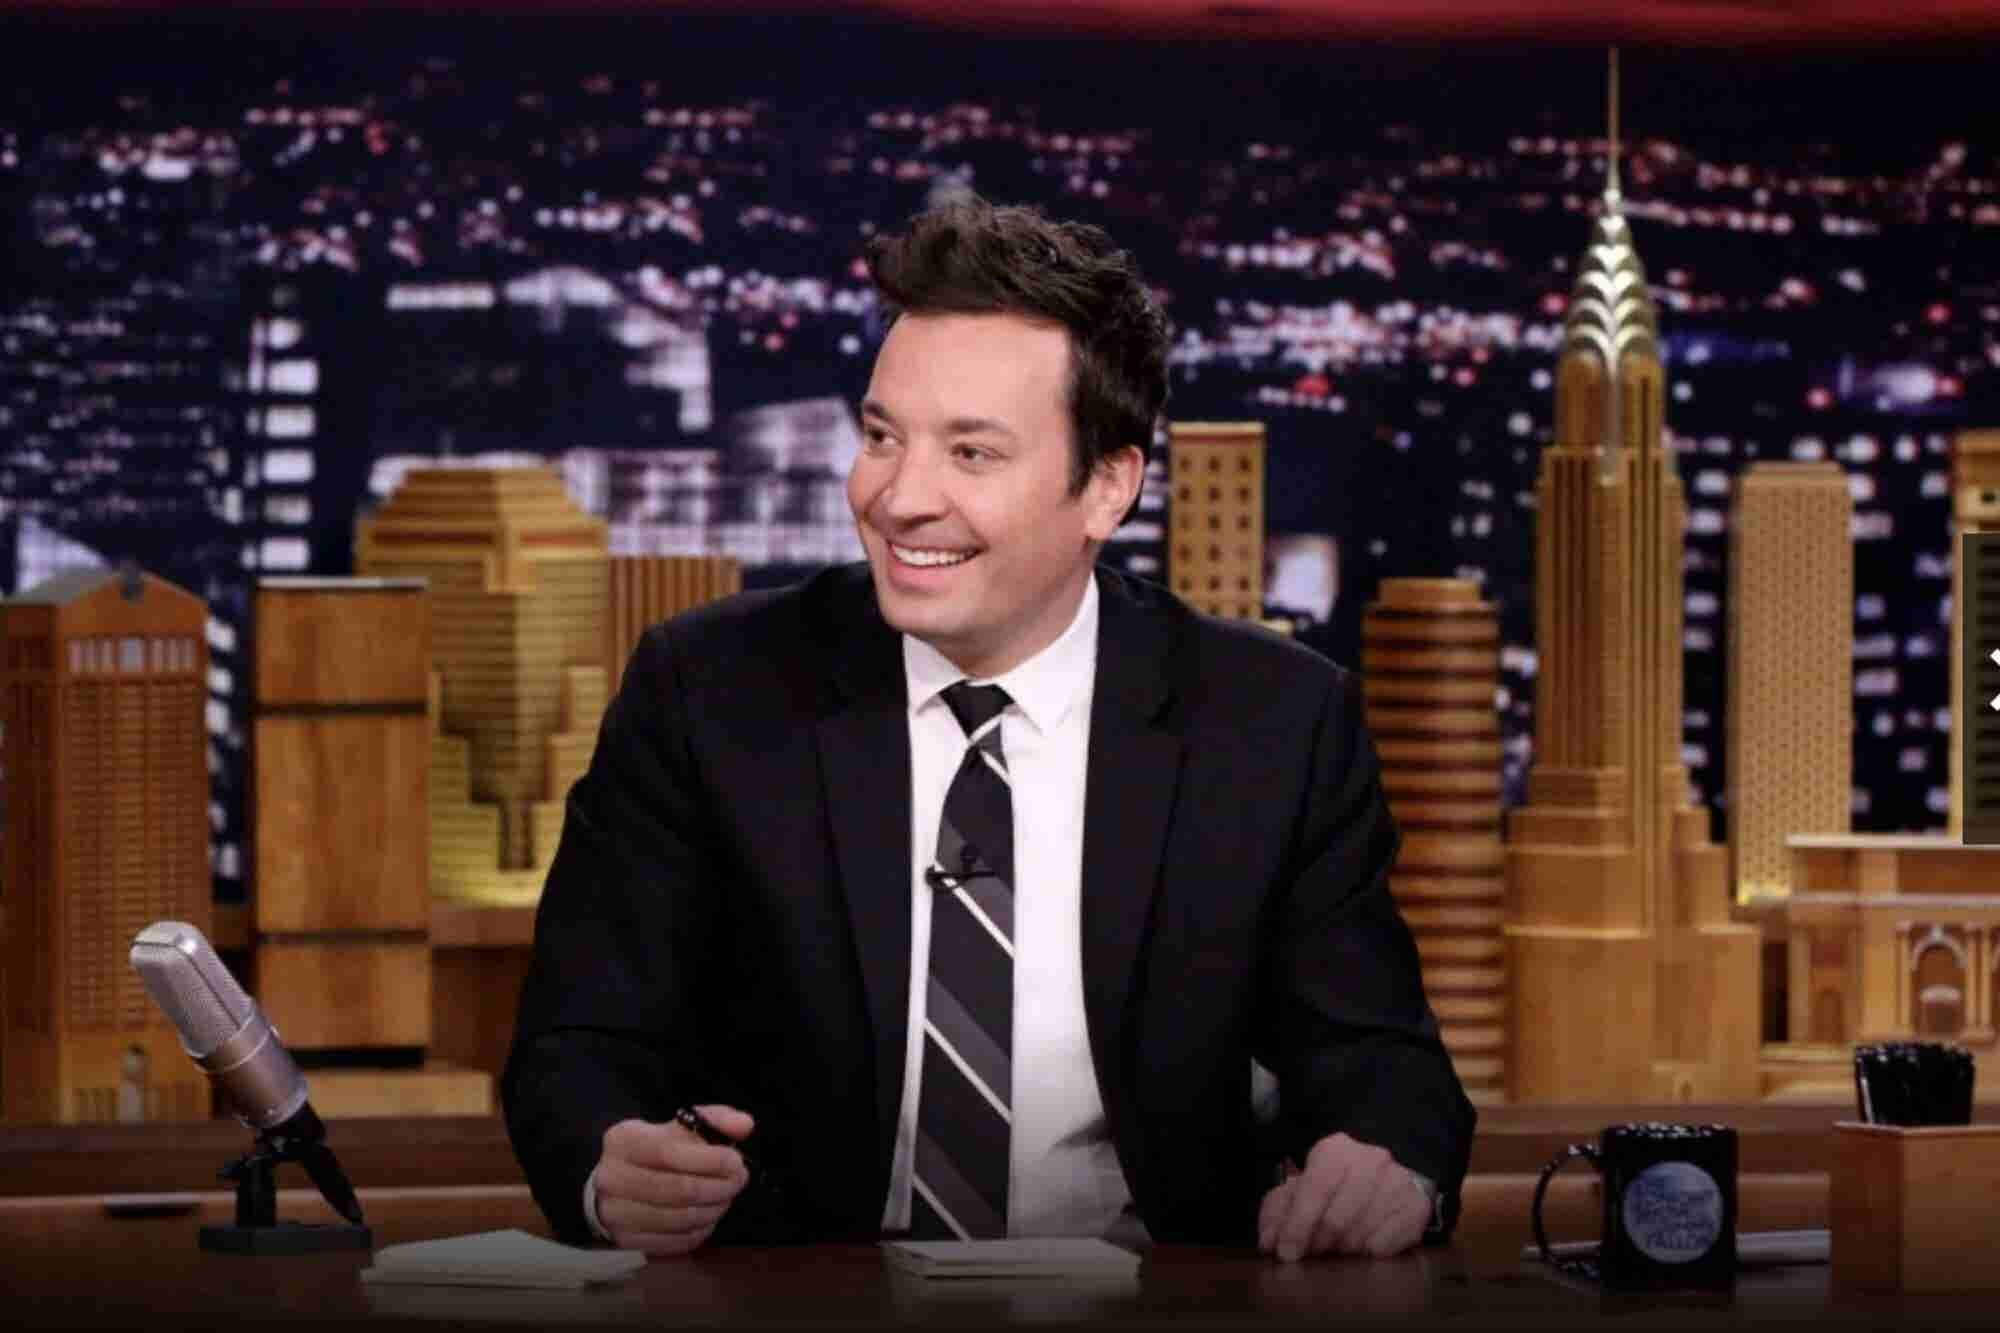 8 frases de Jimmy Fallon para motivarte y hacerte reír